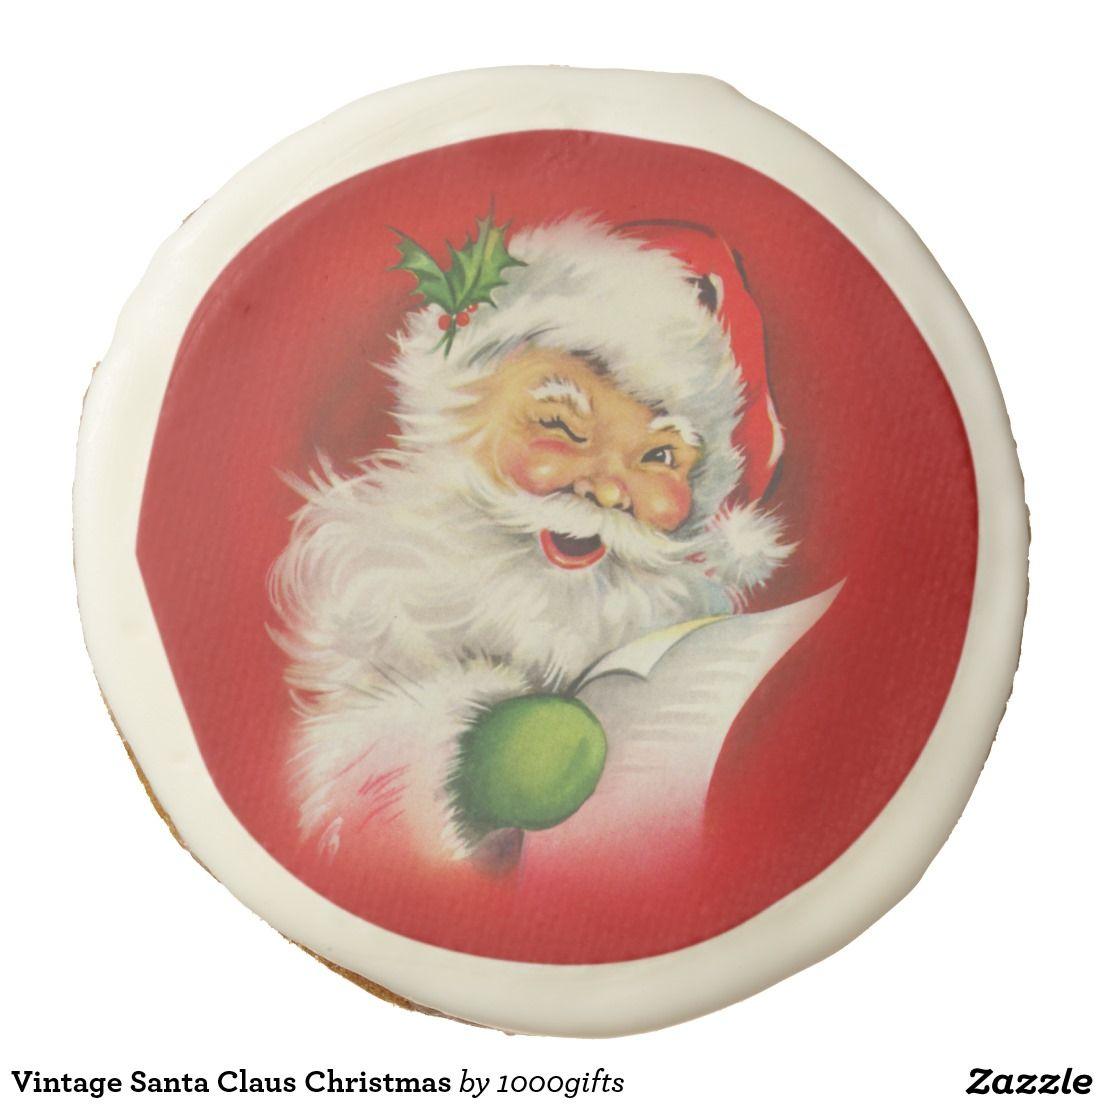 Vintage Santa Claus Christmas Sugar Cookie